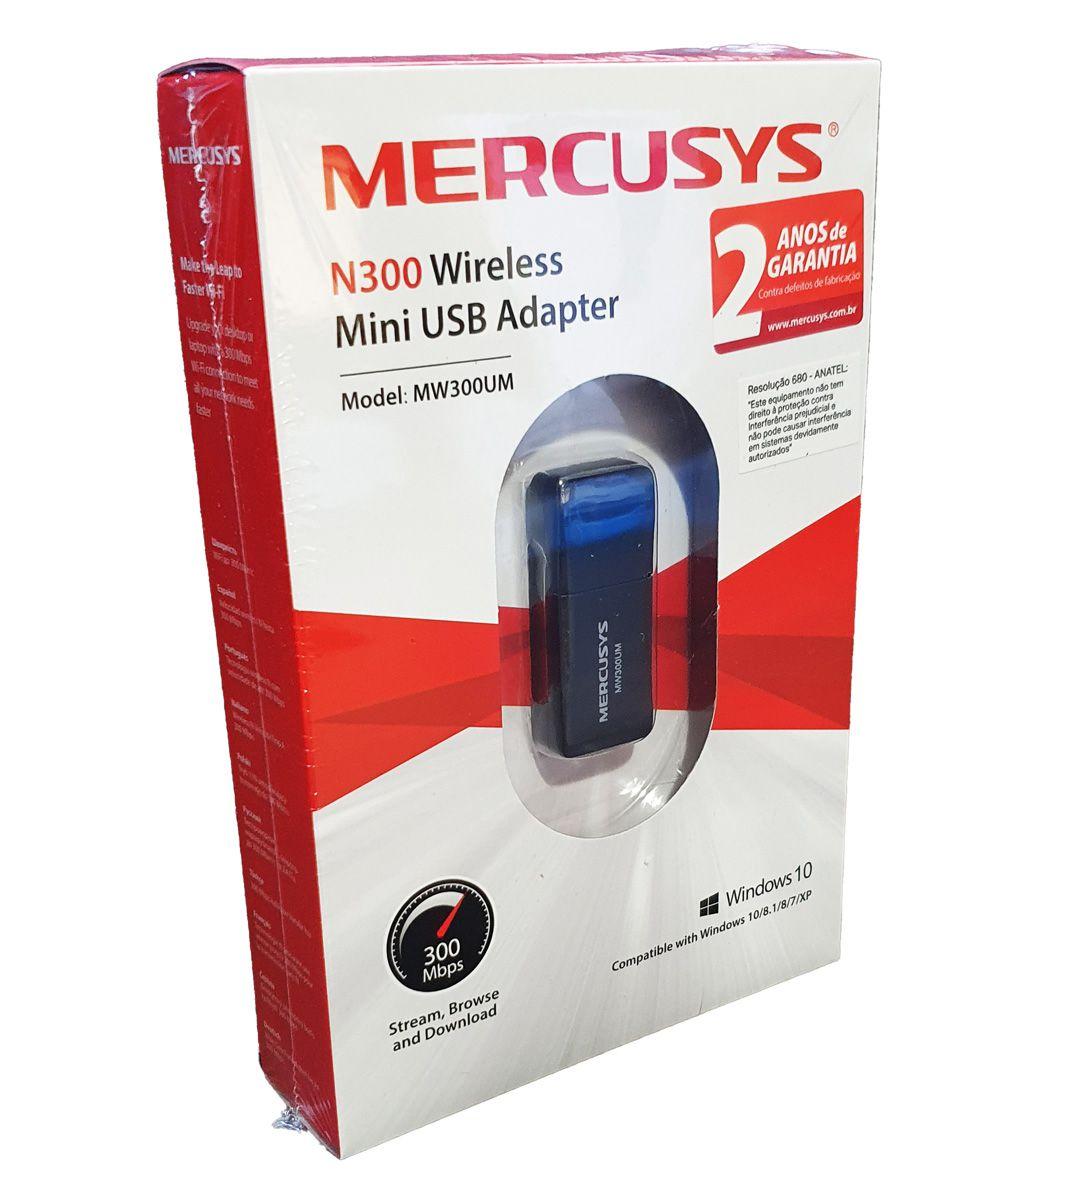 Adaptador Wireless USB N300 Mercusys Compacto 300mbps